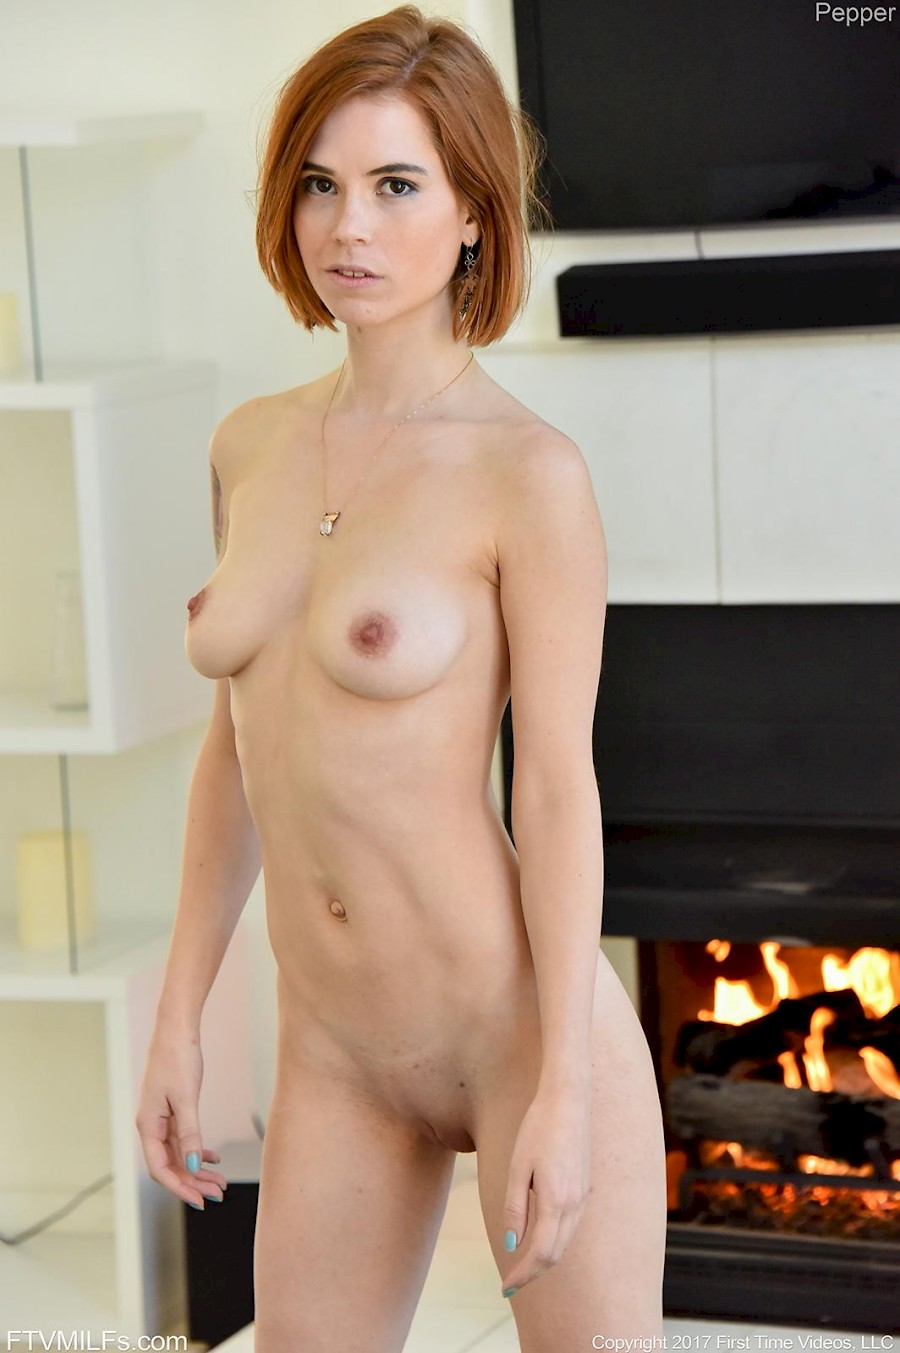 Paget brewster images naked